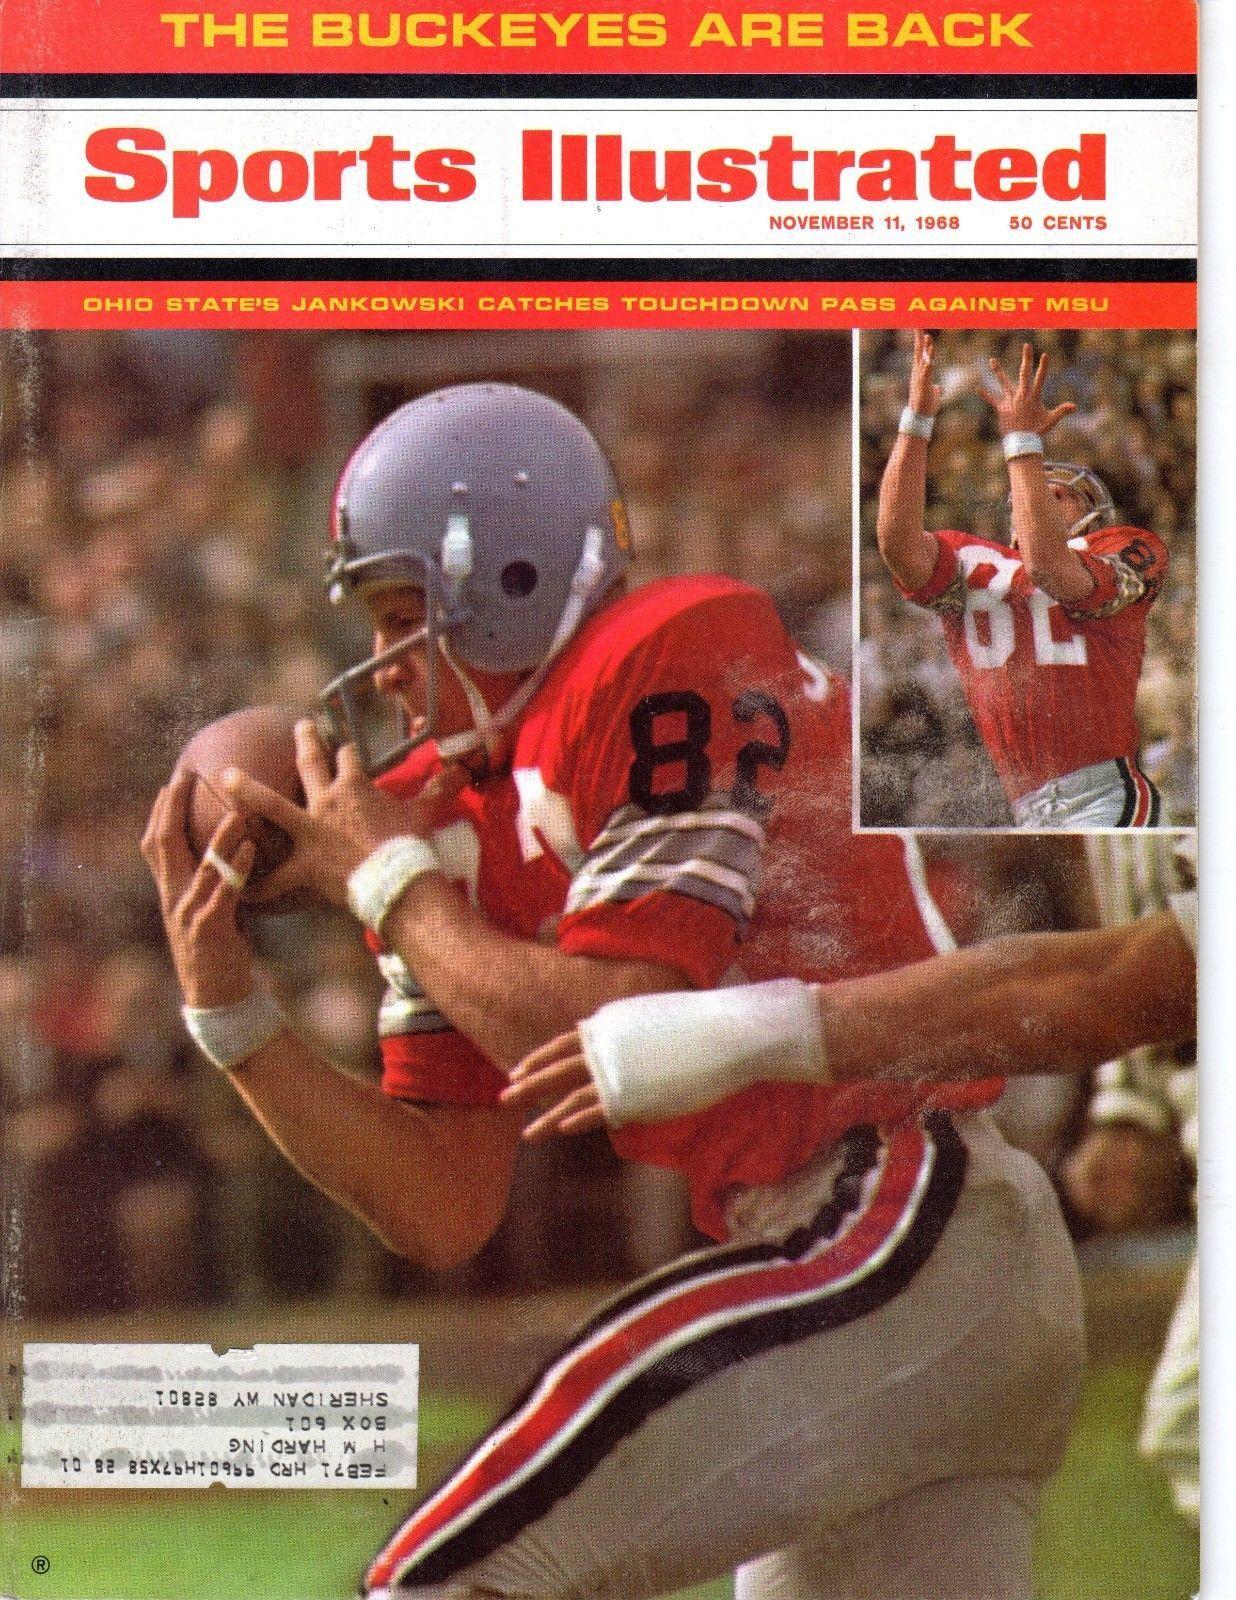 1968 Nov 11 Sports Illustrated Magazine Football Bruce Jankowski Ohio State GD | eBay